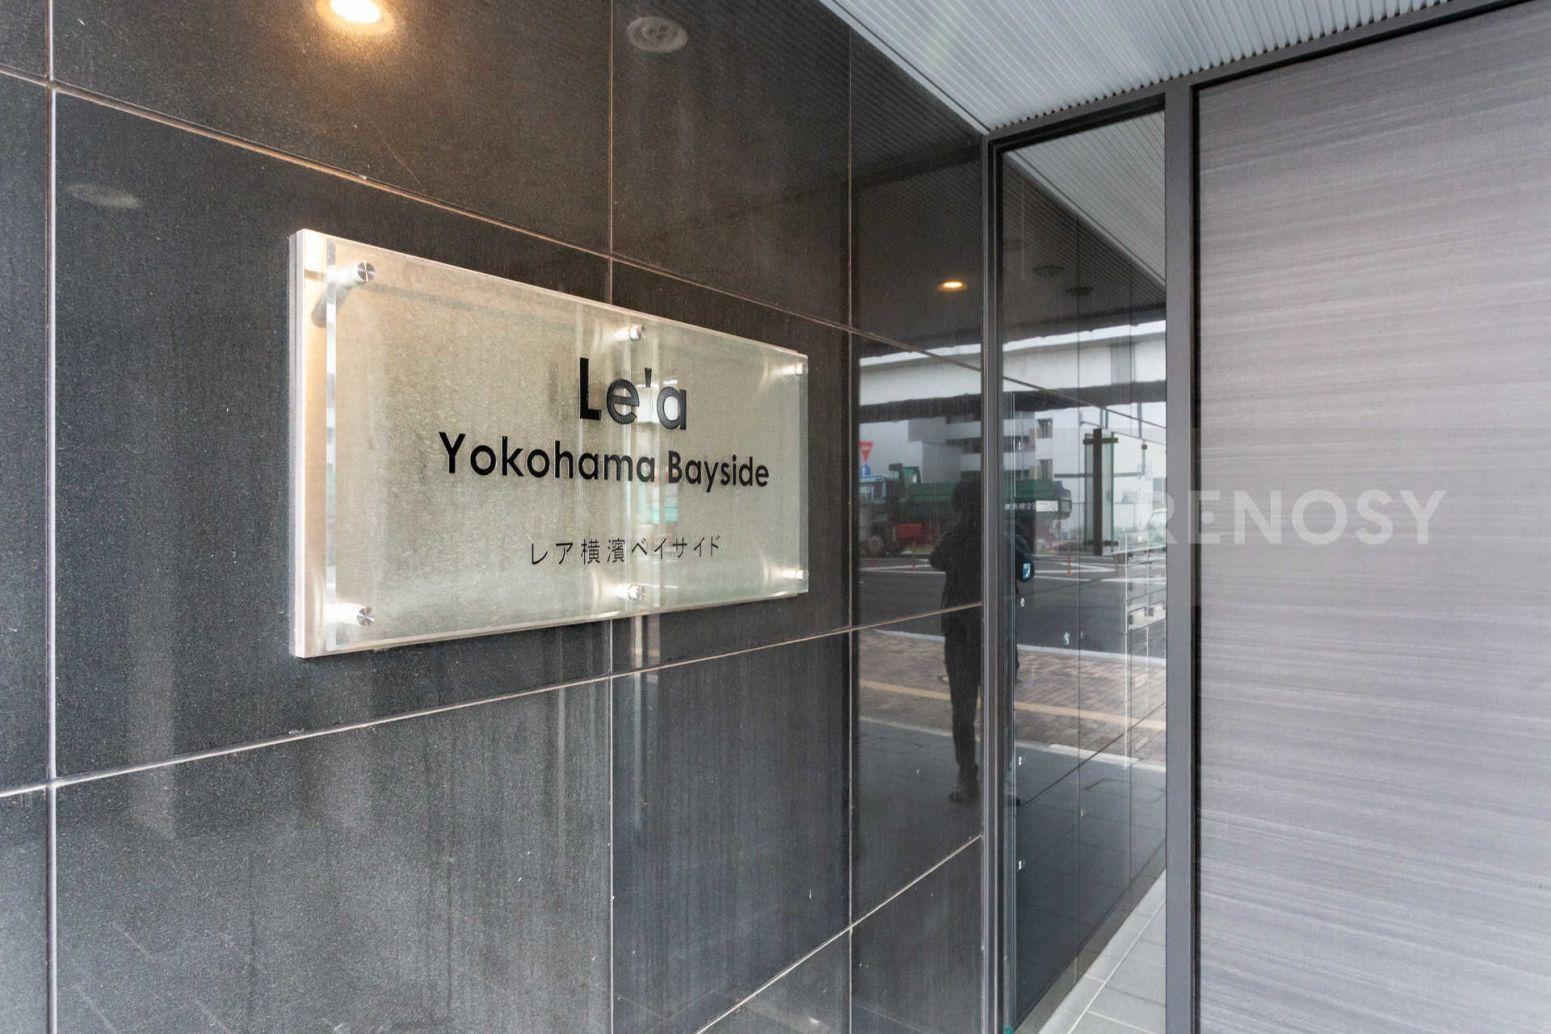 Le'a横濱ベイサイド